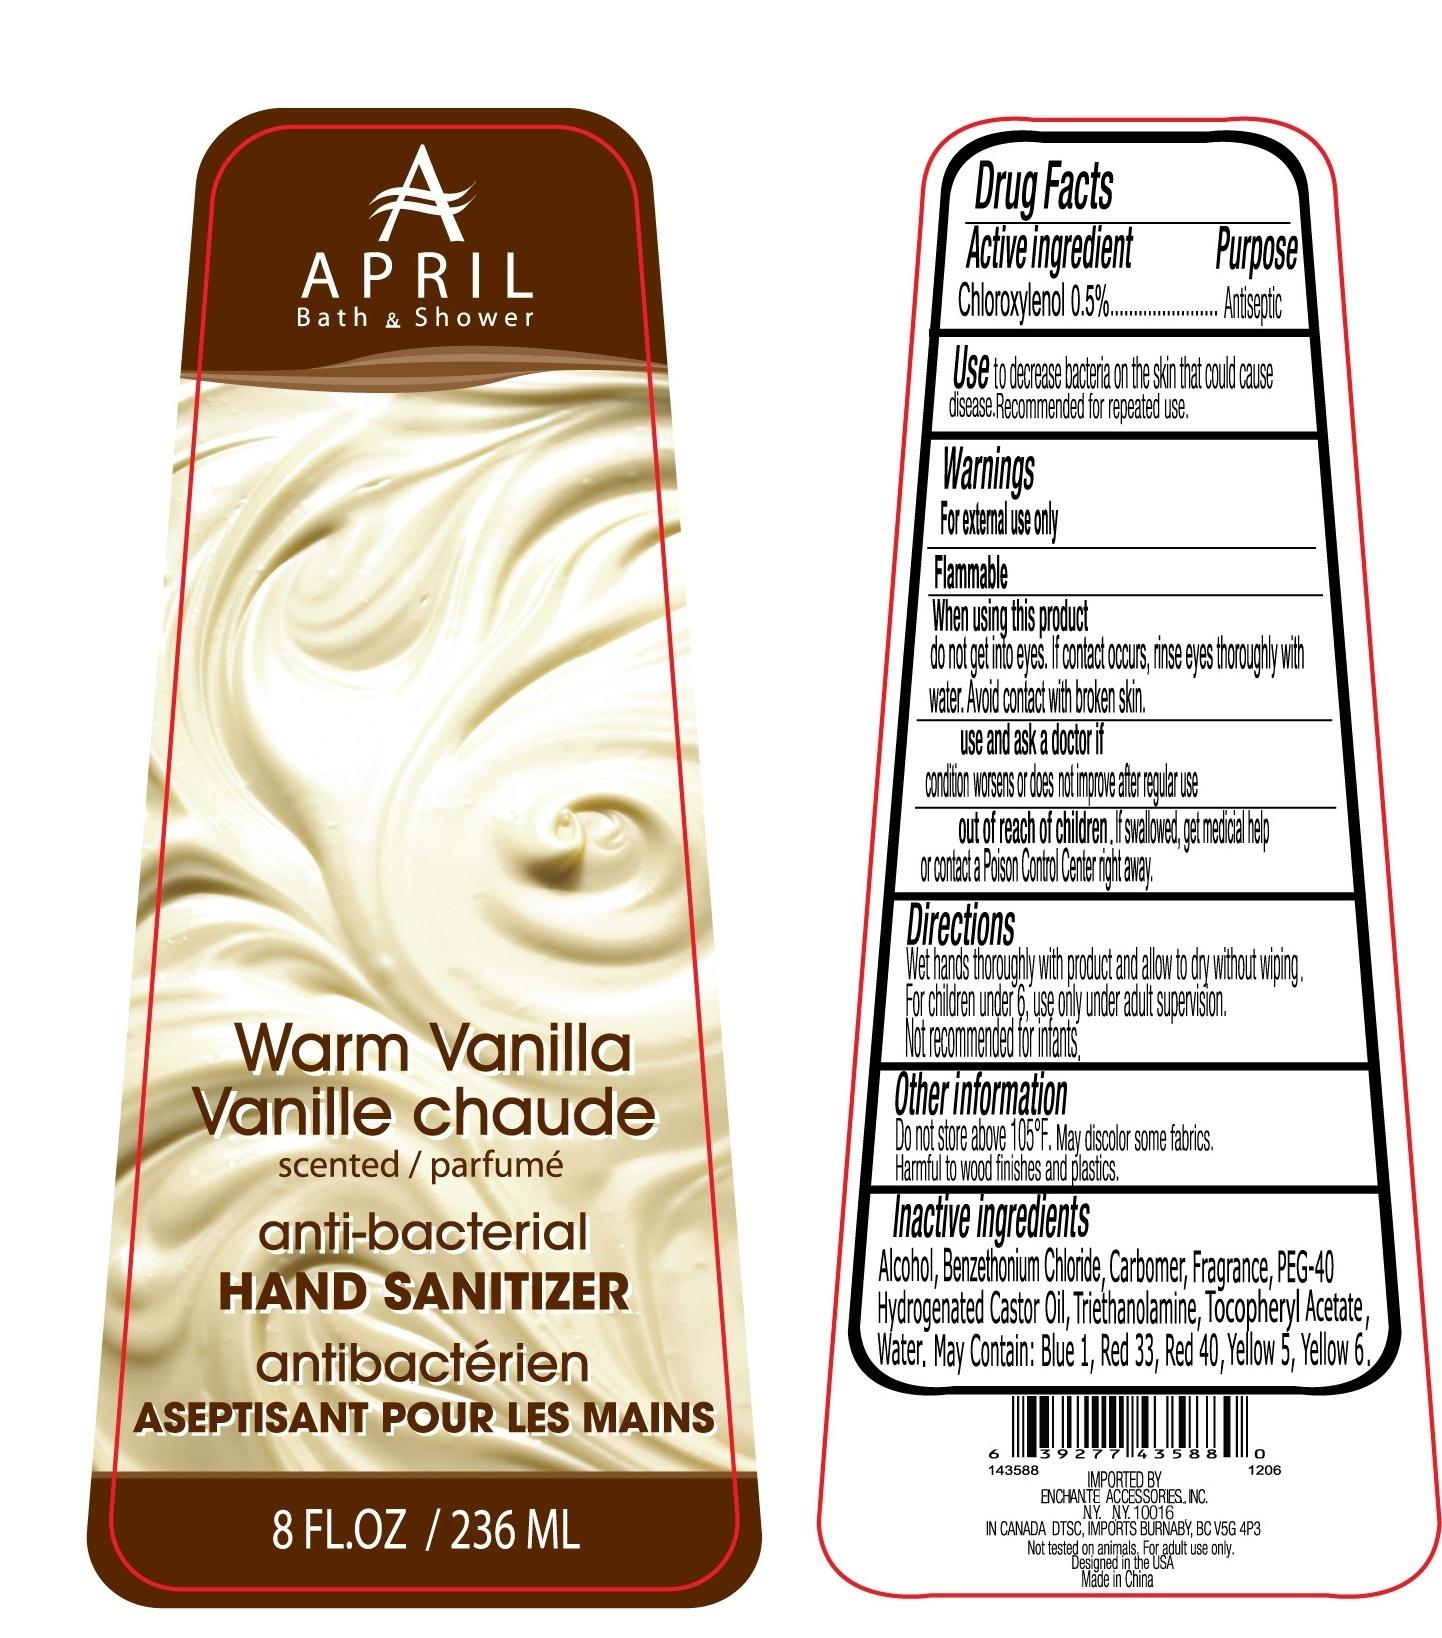 April Bath And Shower Warm Vanilla Scented Hand Sanitizer Anti-bacterial (Chloroxylenol) Liquid [Enchante Accessories Inc. ]